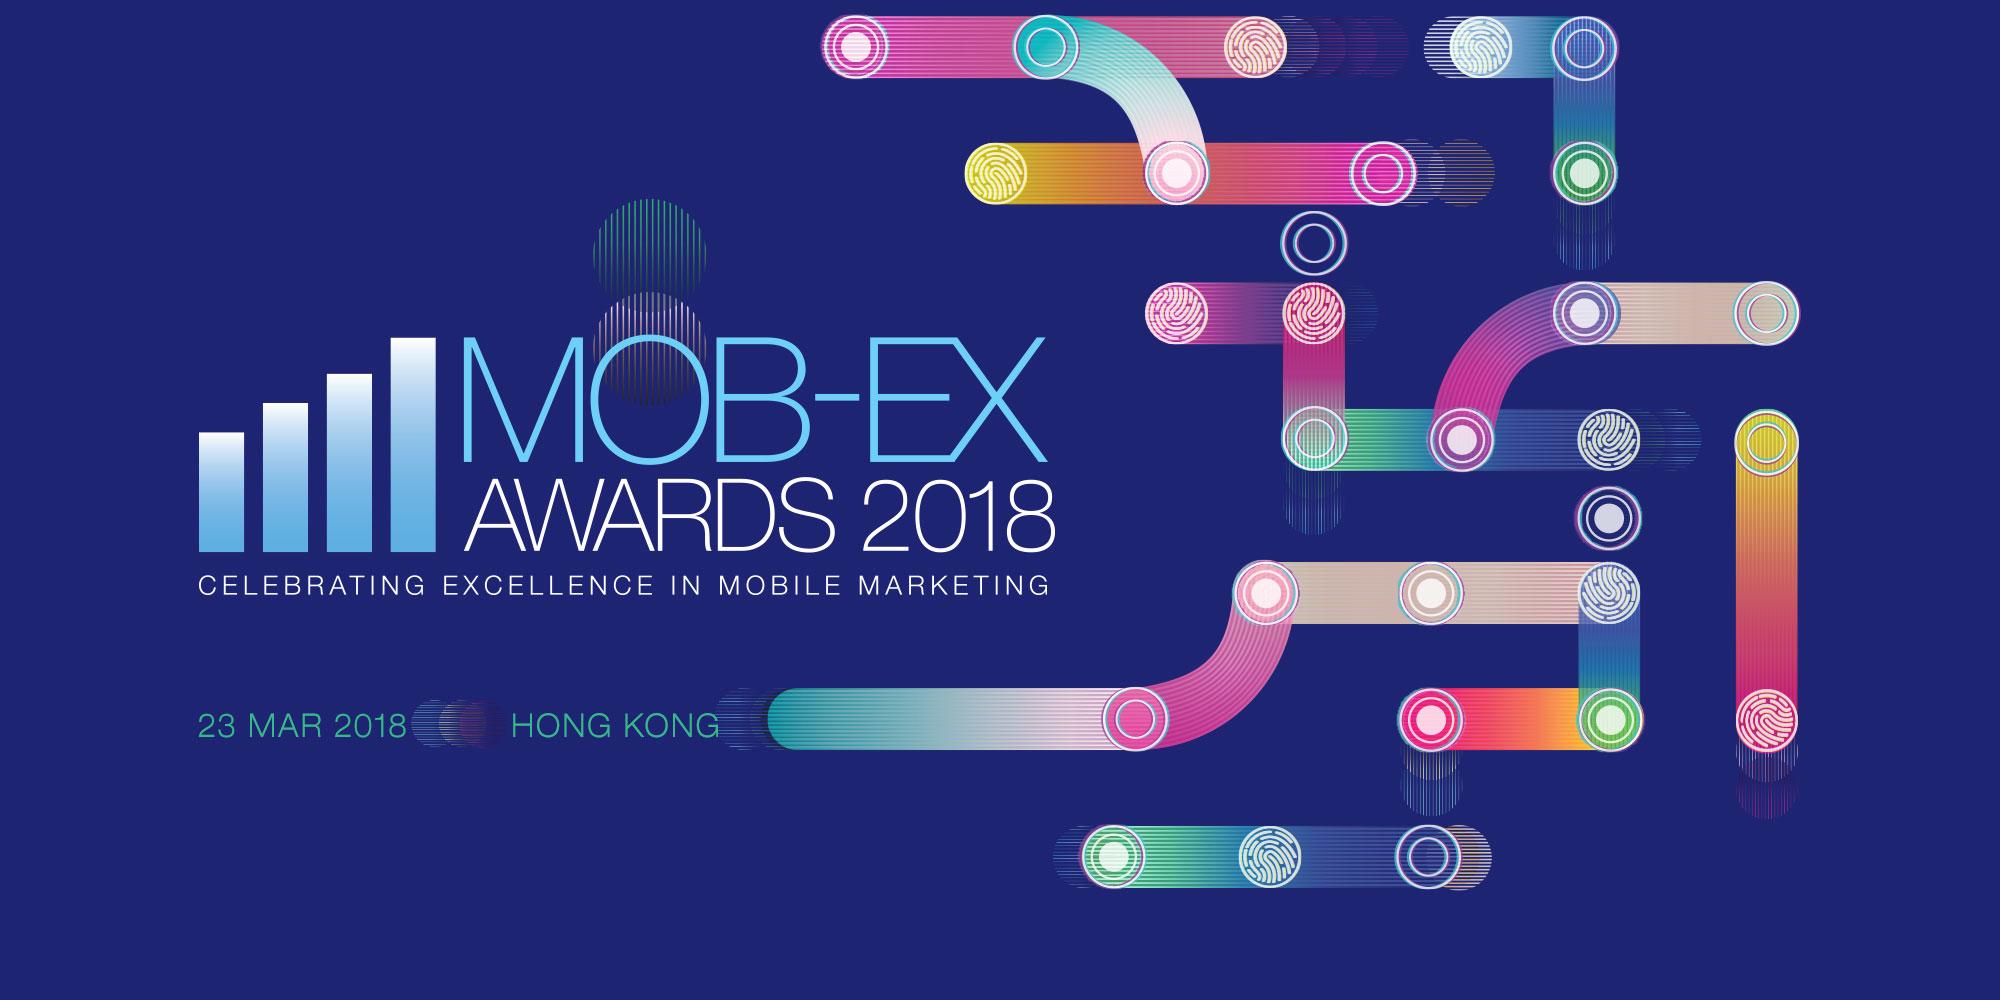 Mob-Ex Awards 2018